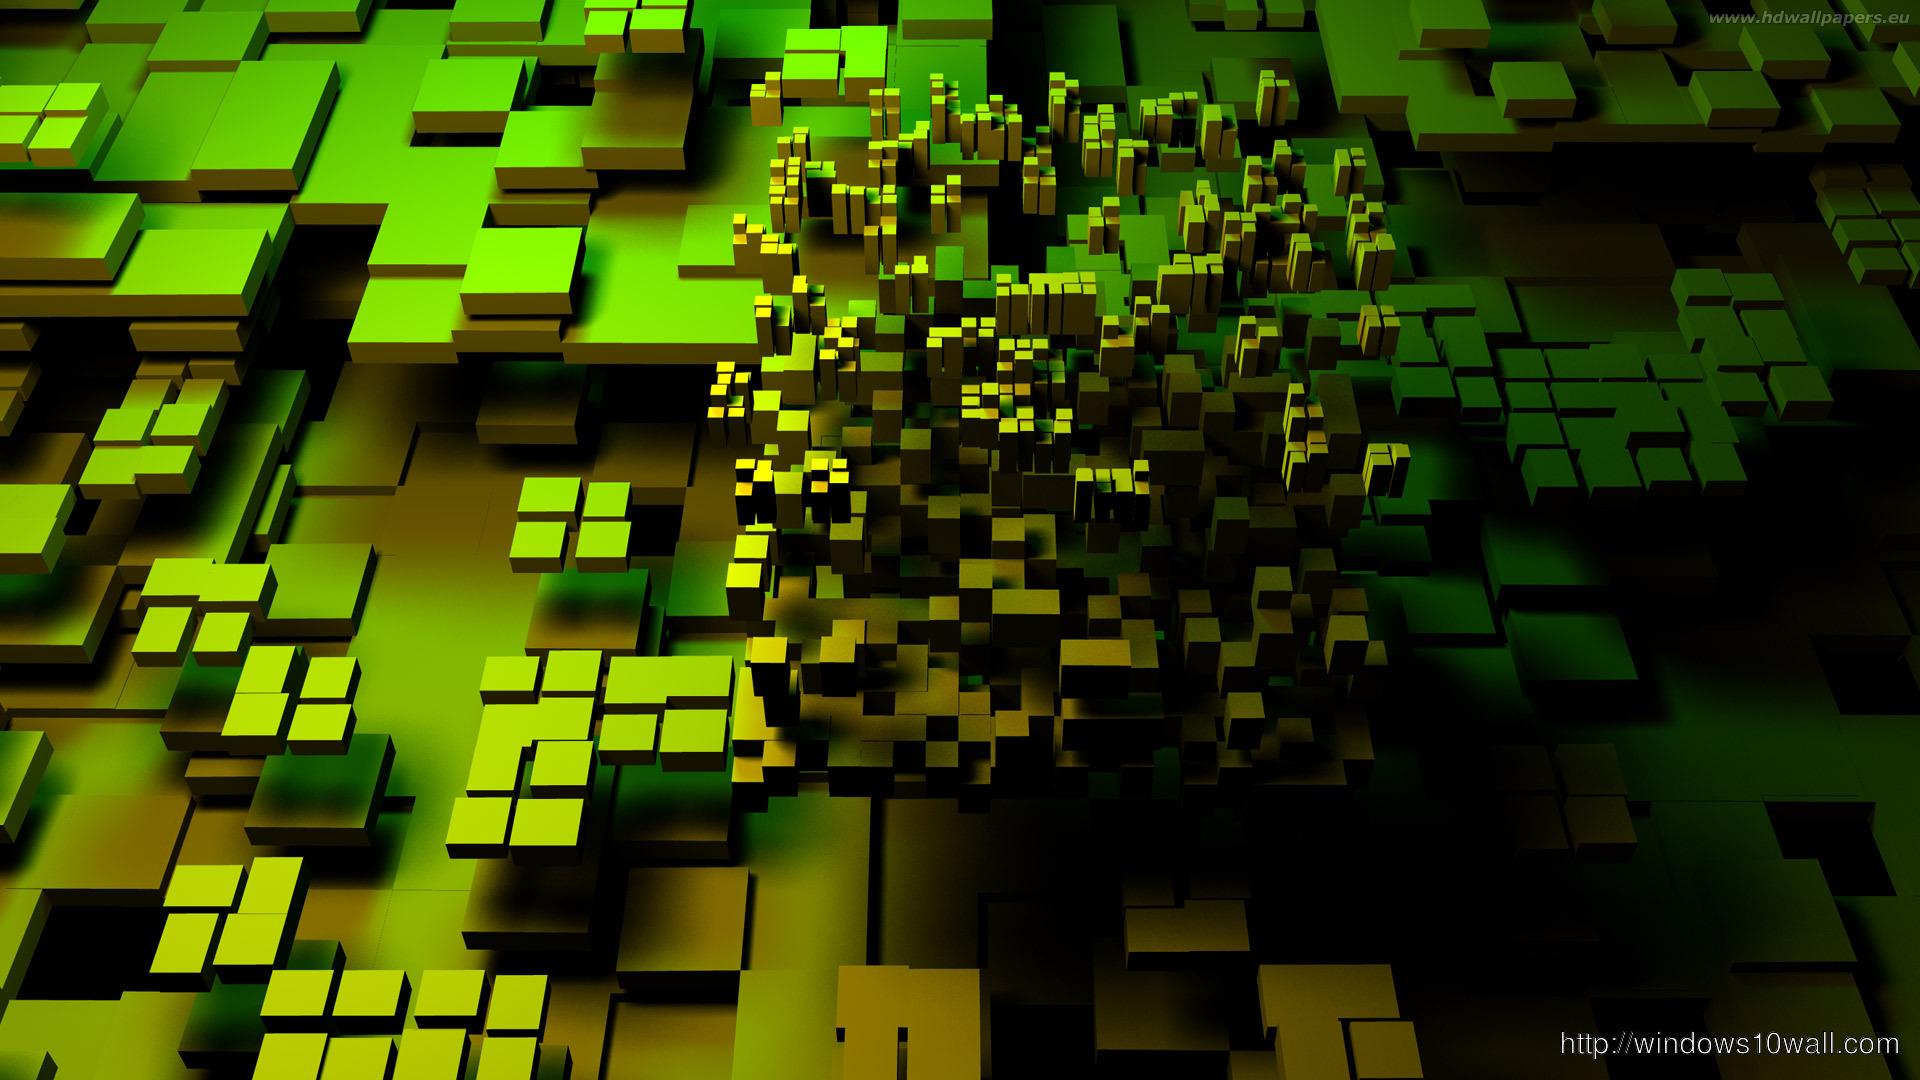 Green Screen Backgrounds Windows 10 Wallpapers